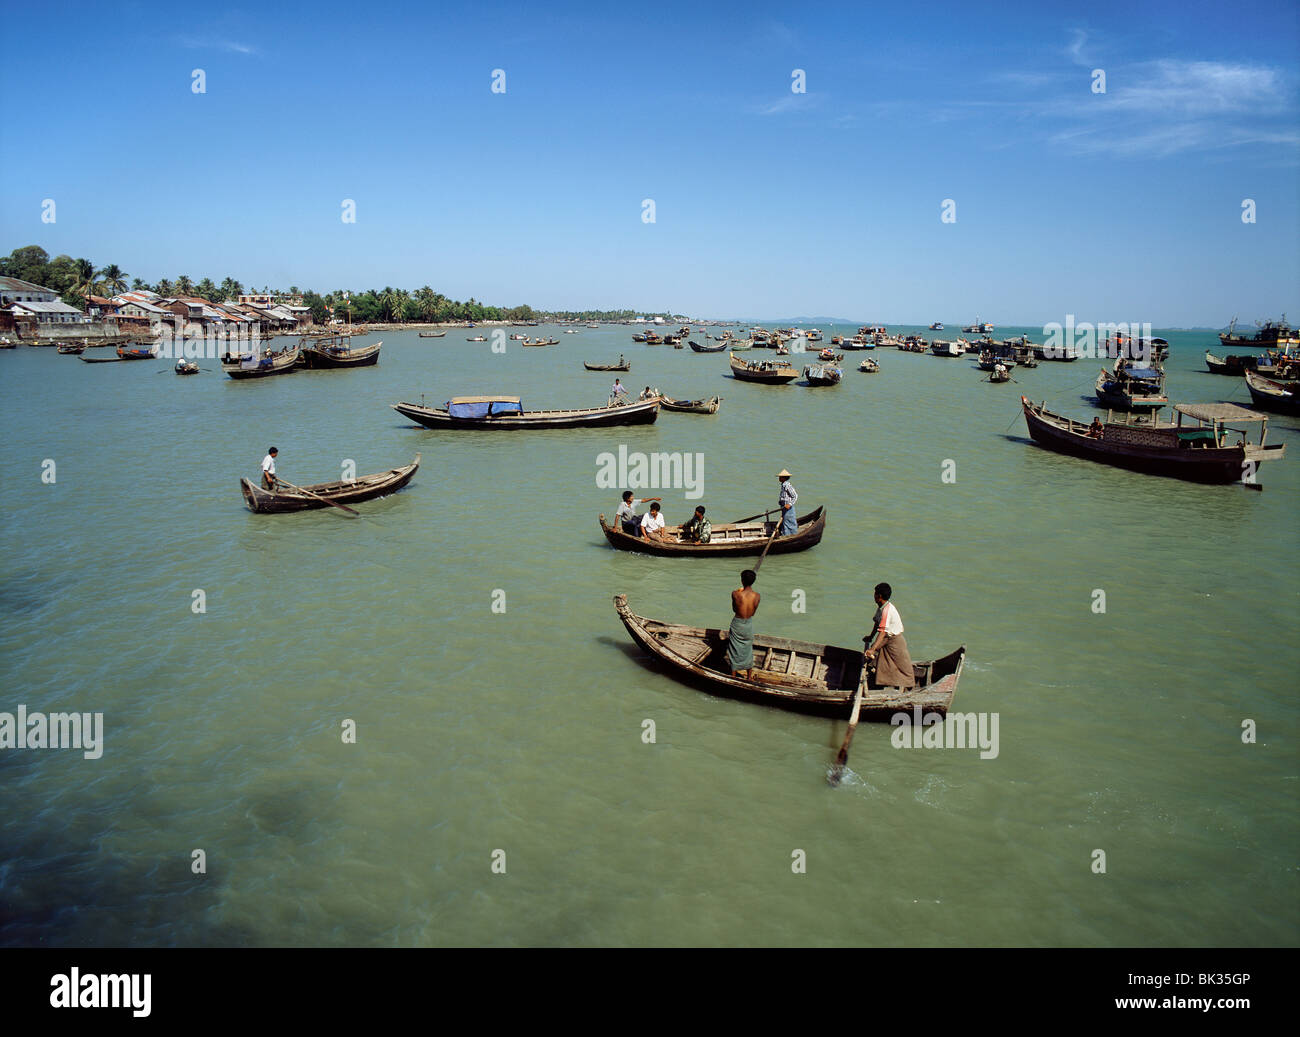 Le port à l'embouchure de la rivière Kaladan, Sittwe, capitale de l'état d'Arakan, le Photo Stock